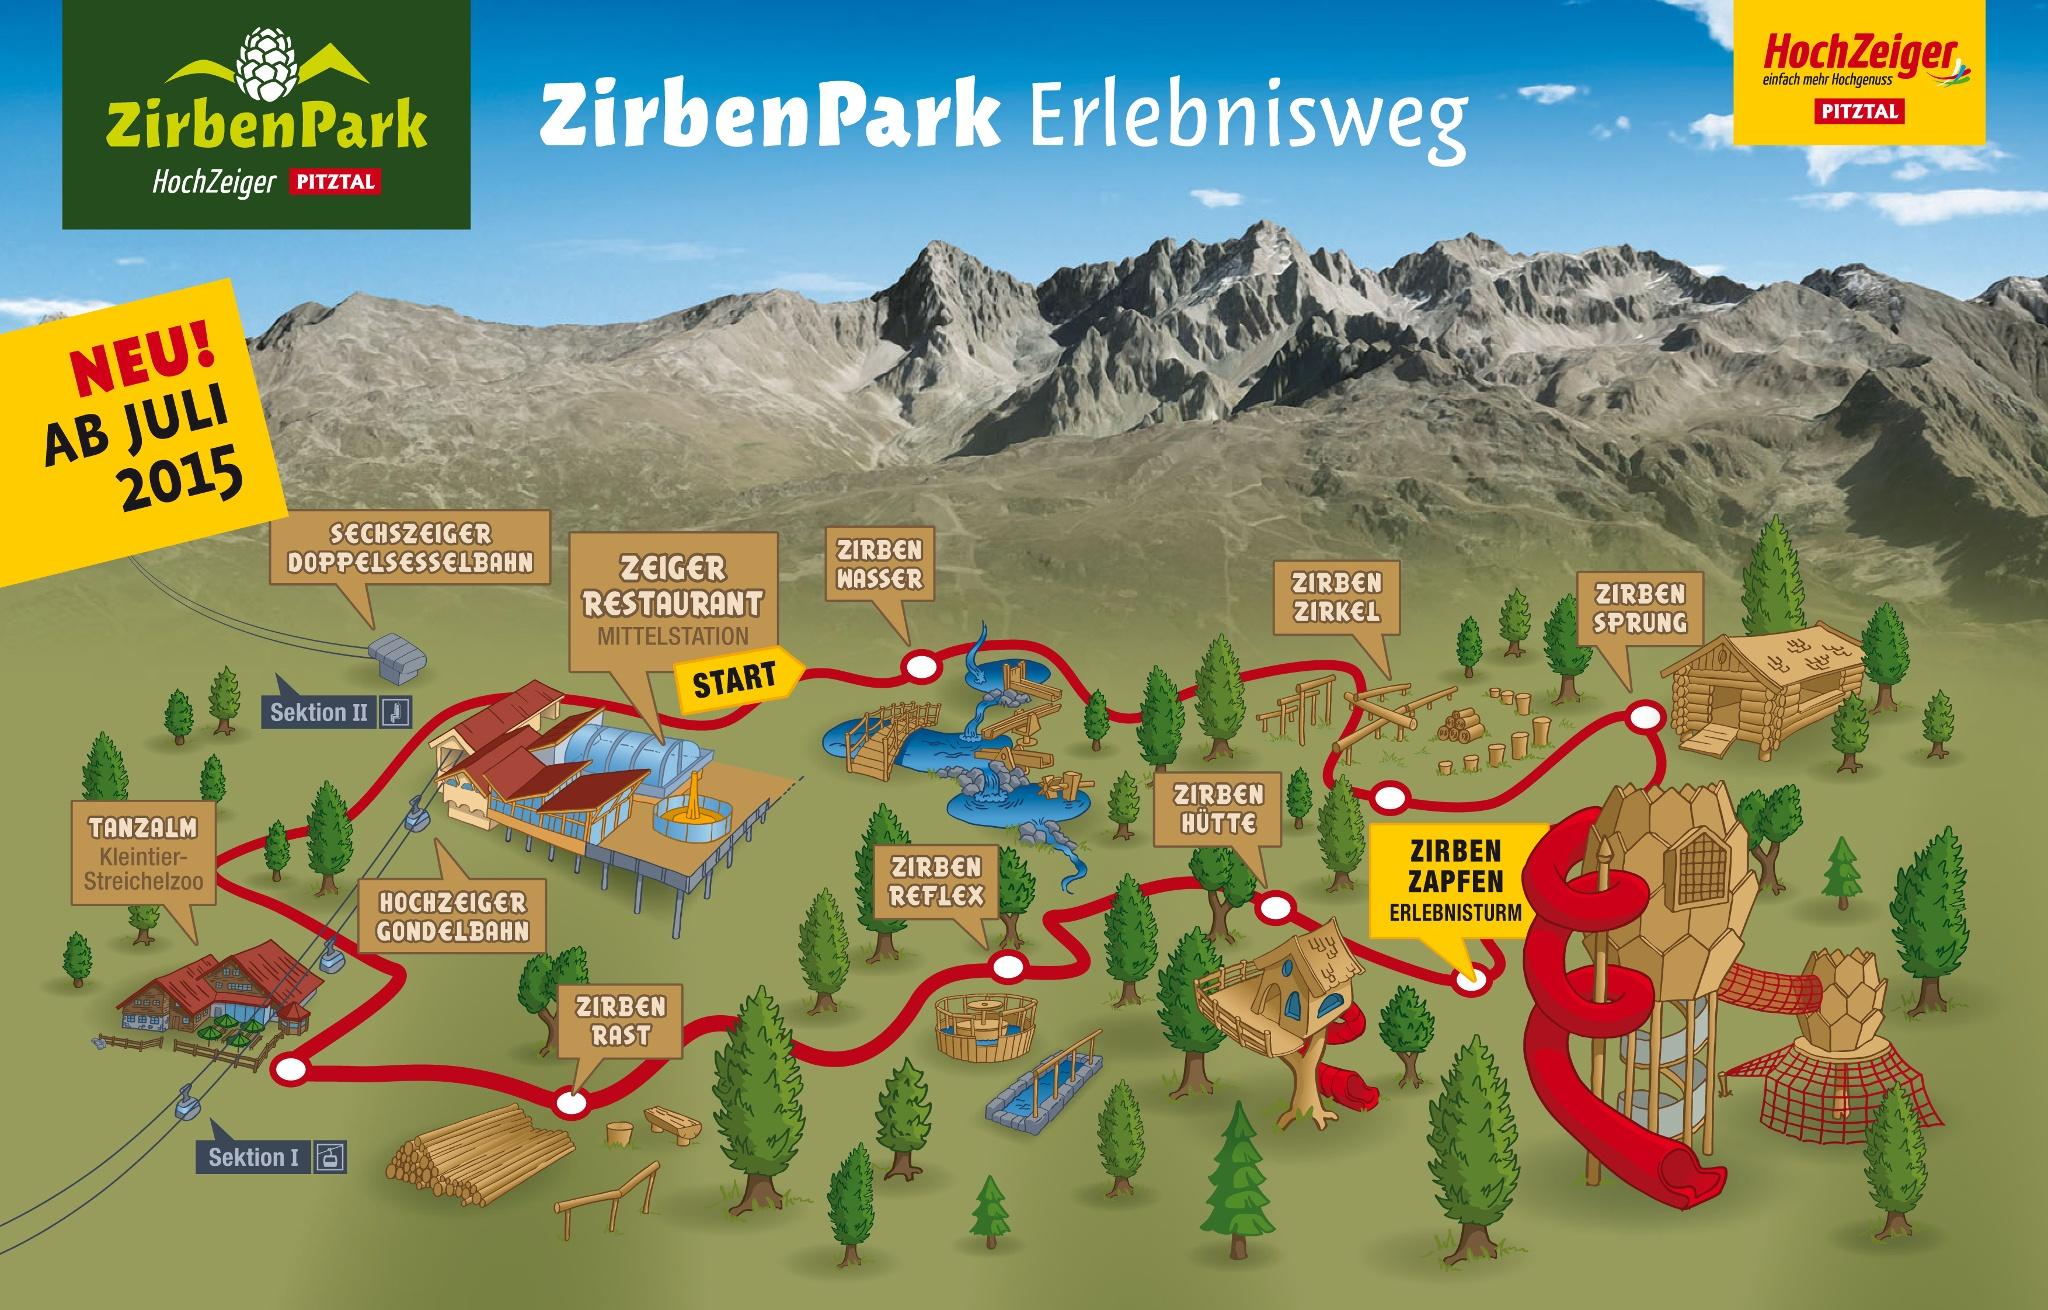 Pitztal Karte.Spaziergang Durch Den Zirben Park Am Hochzeiger Wanderung